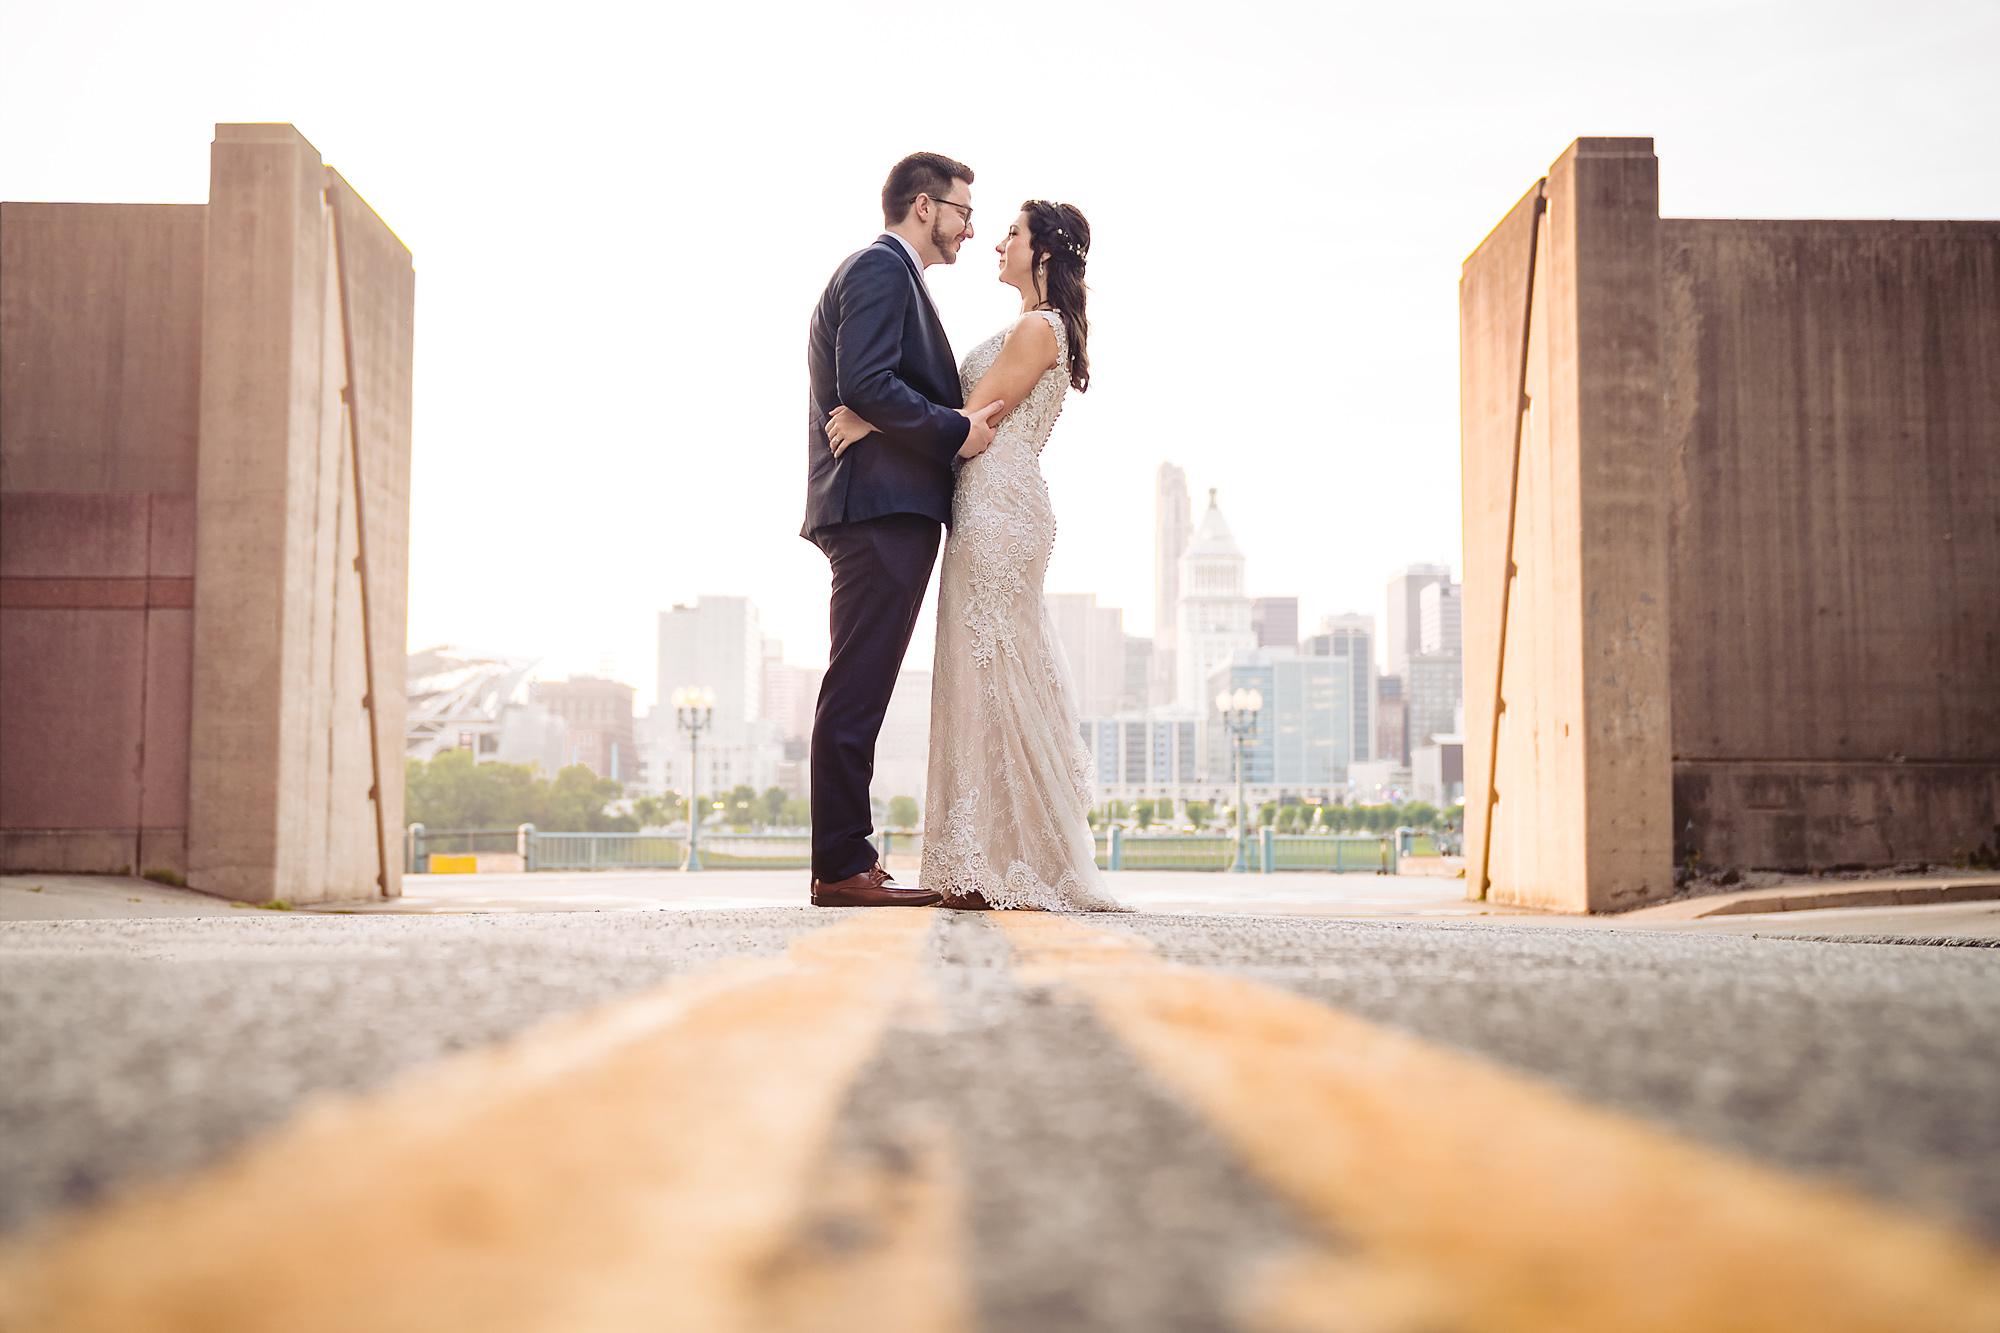 Embassy-Suites-Rivercenter-Wedding-Photography-31.jpg